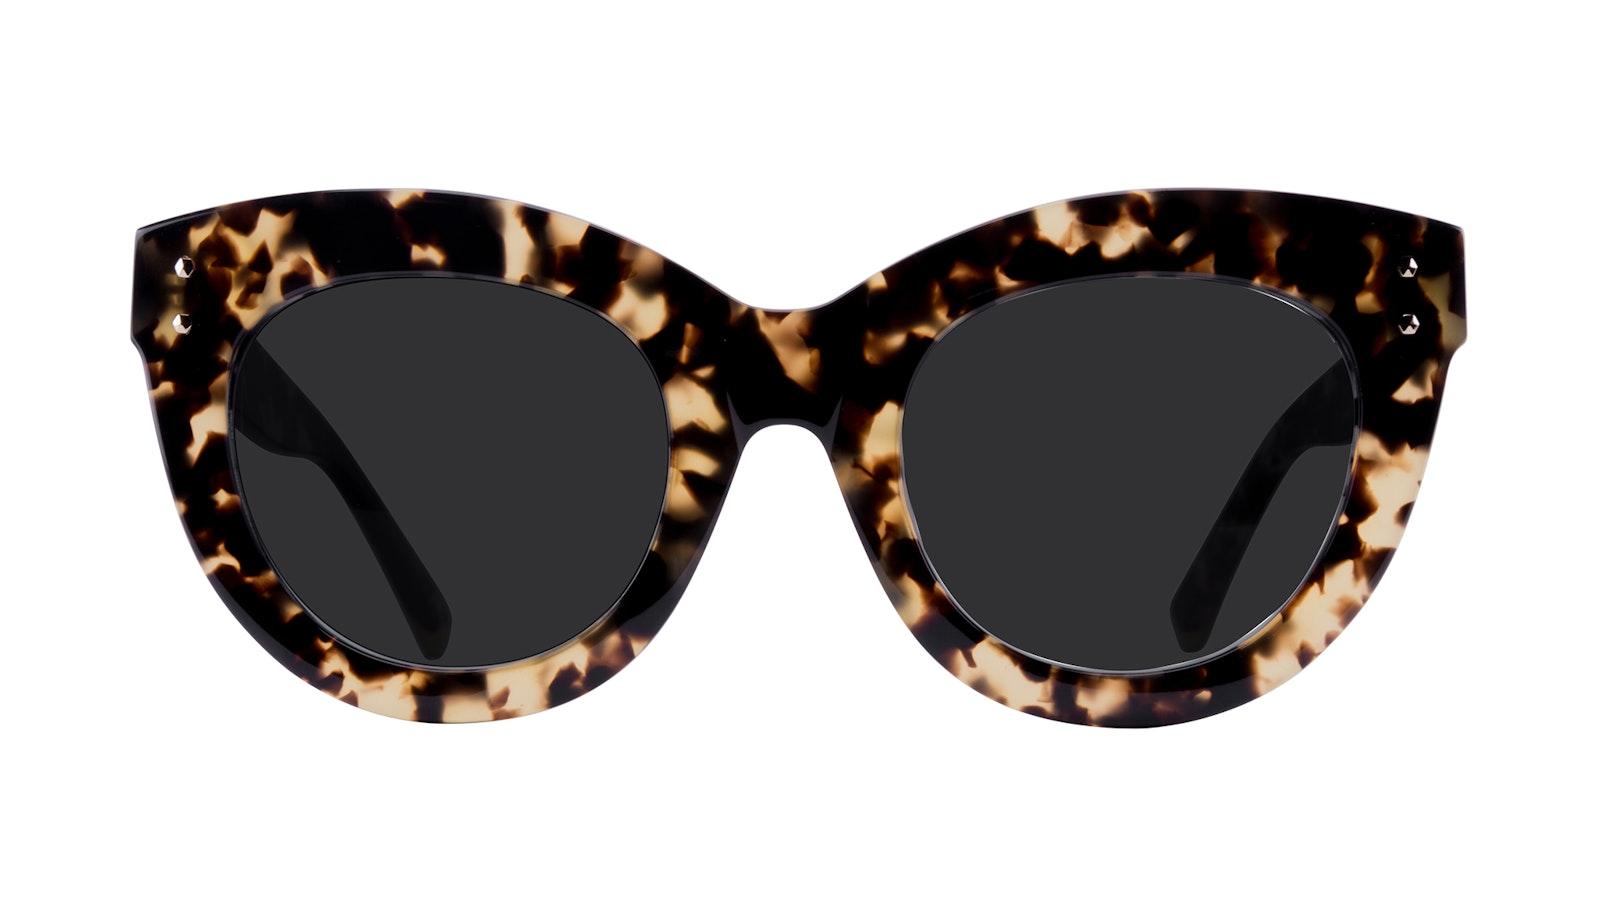 Affordable Fashion Glasses Sunglasses Women Dusk Tortoise